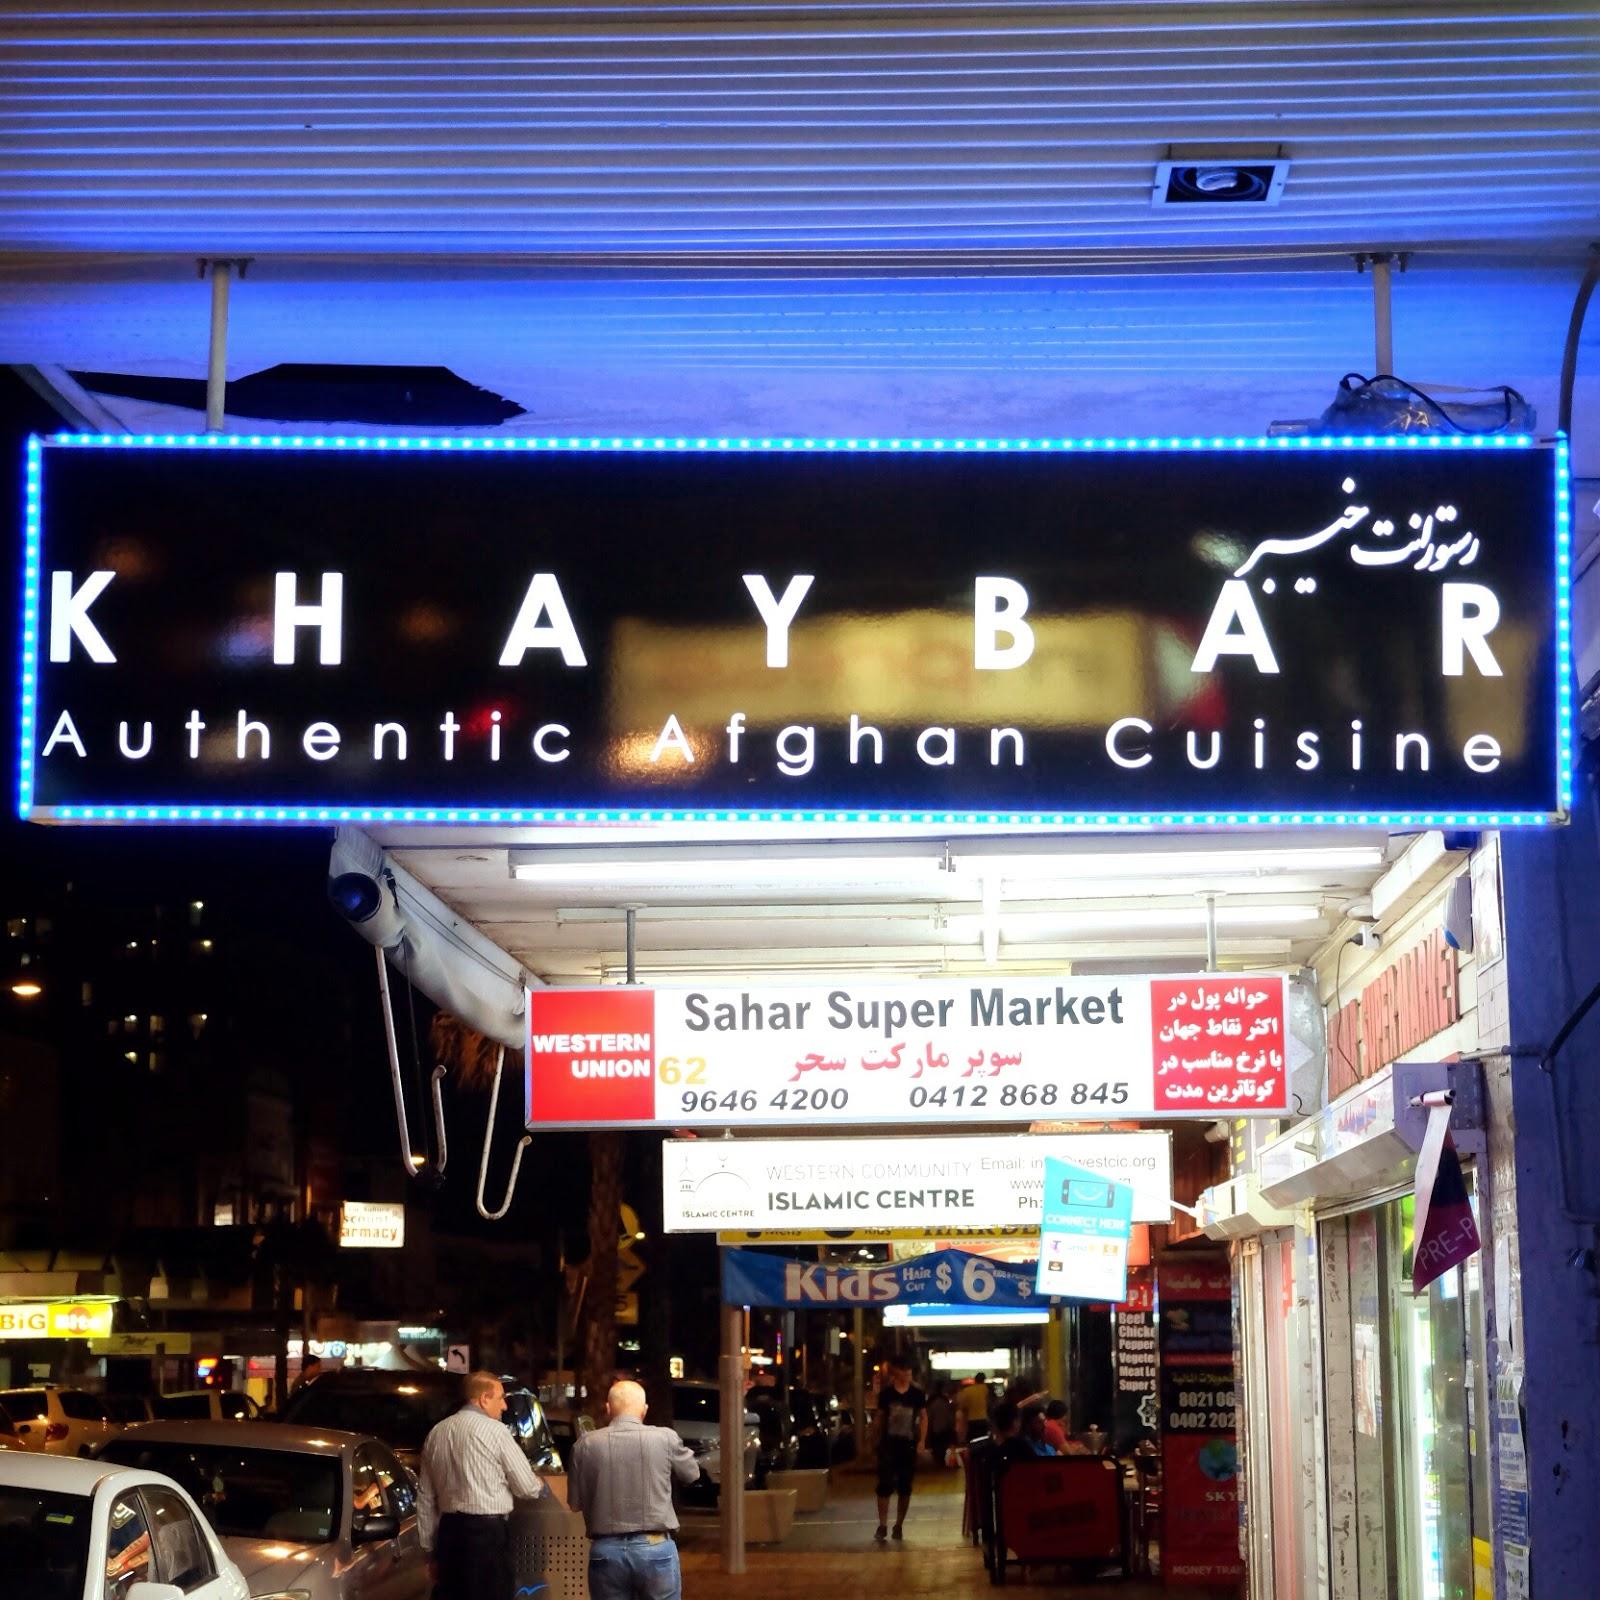 Khaybar Restaurant - Auburn